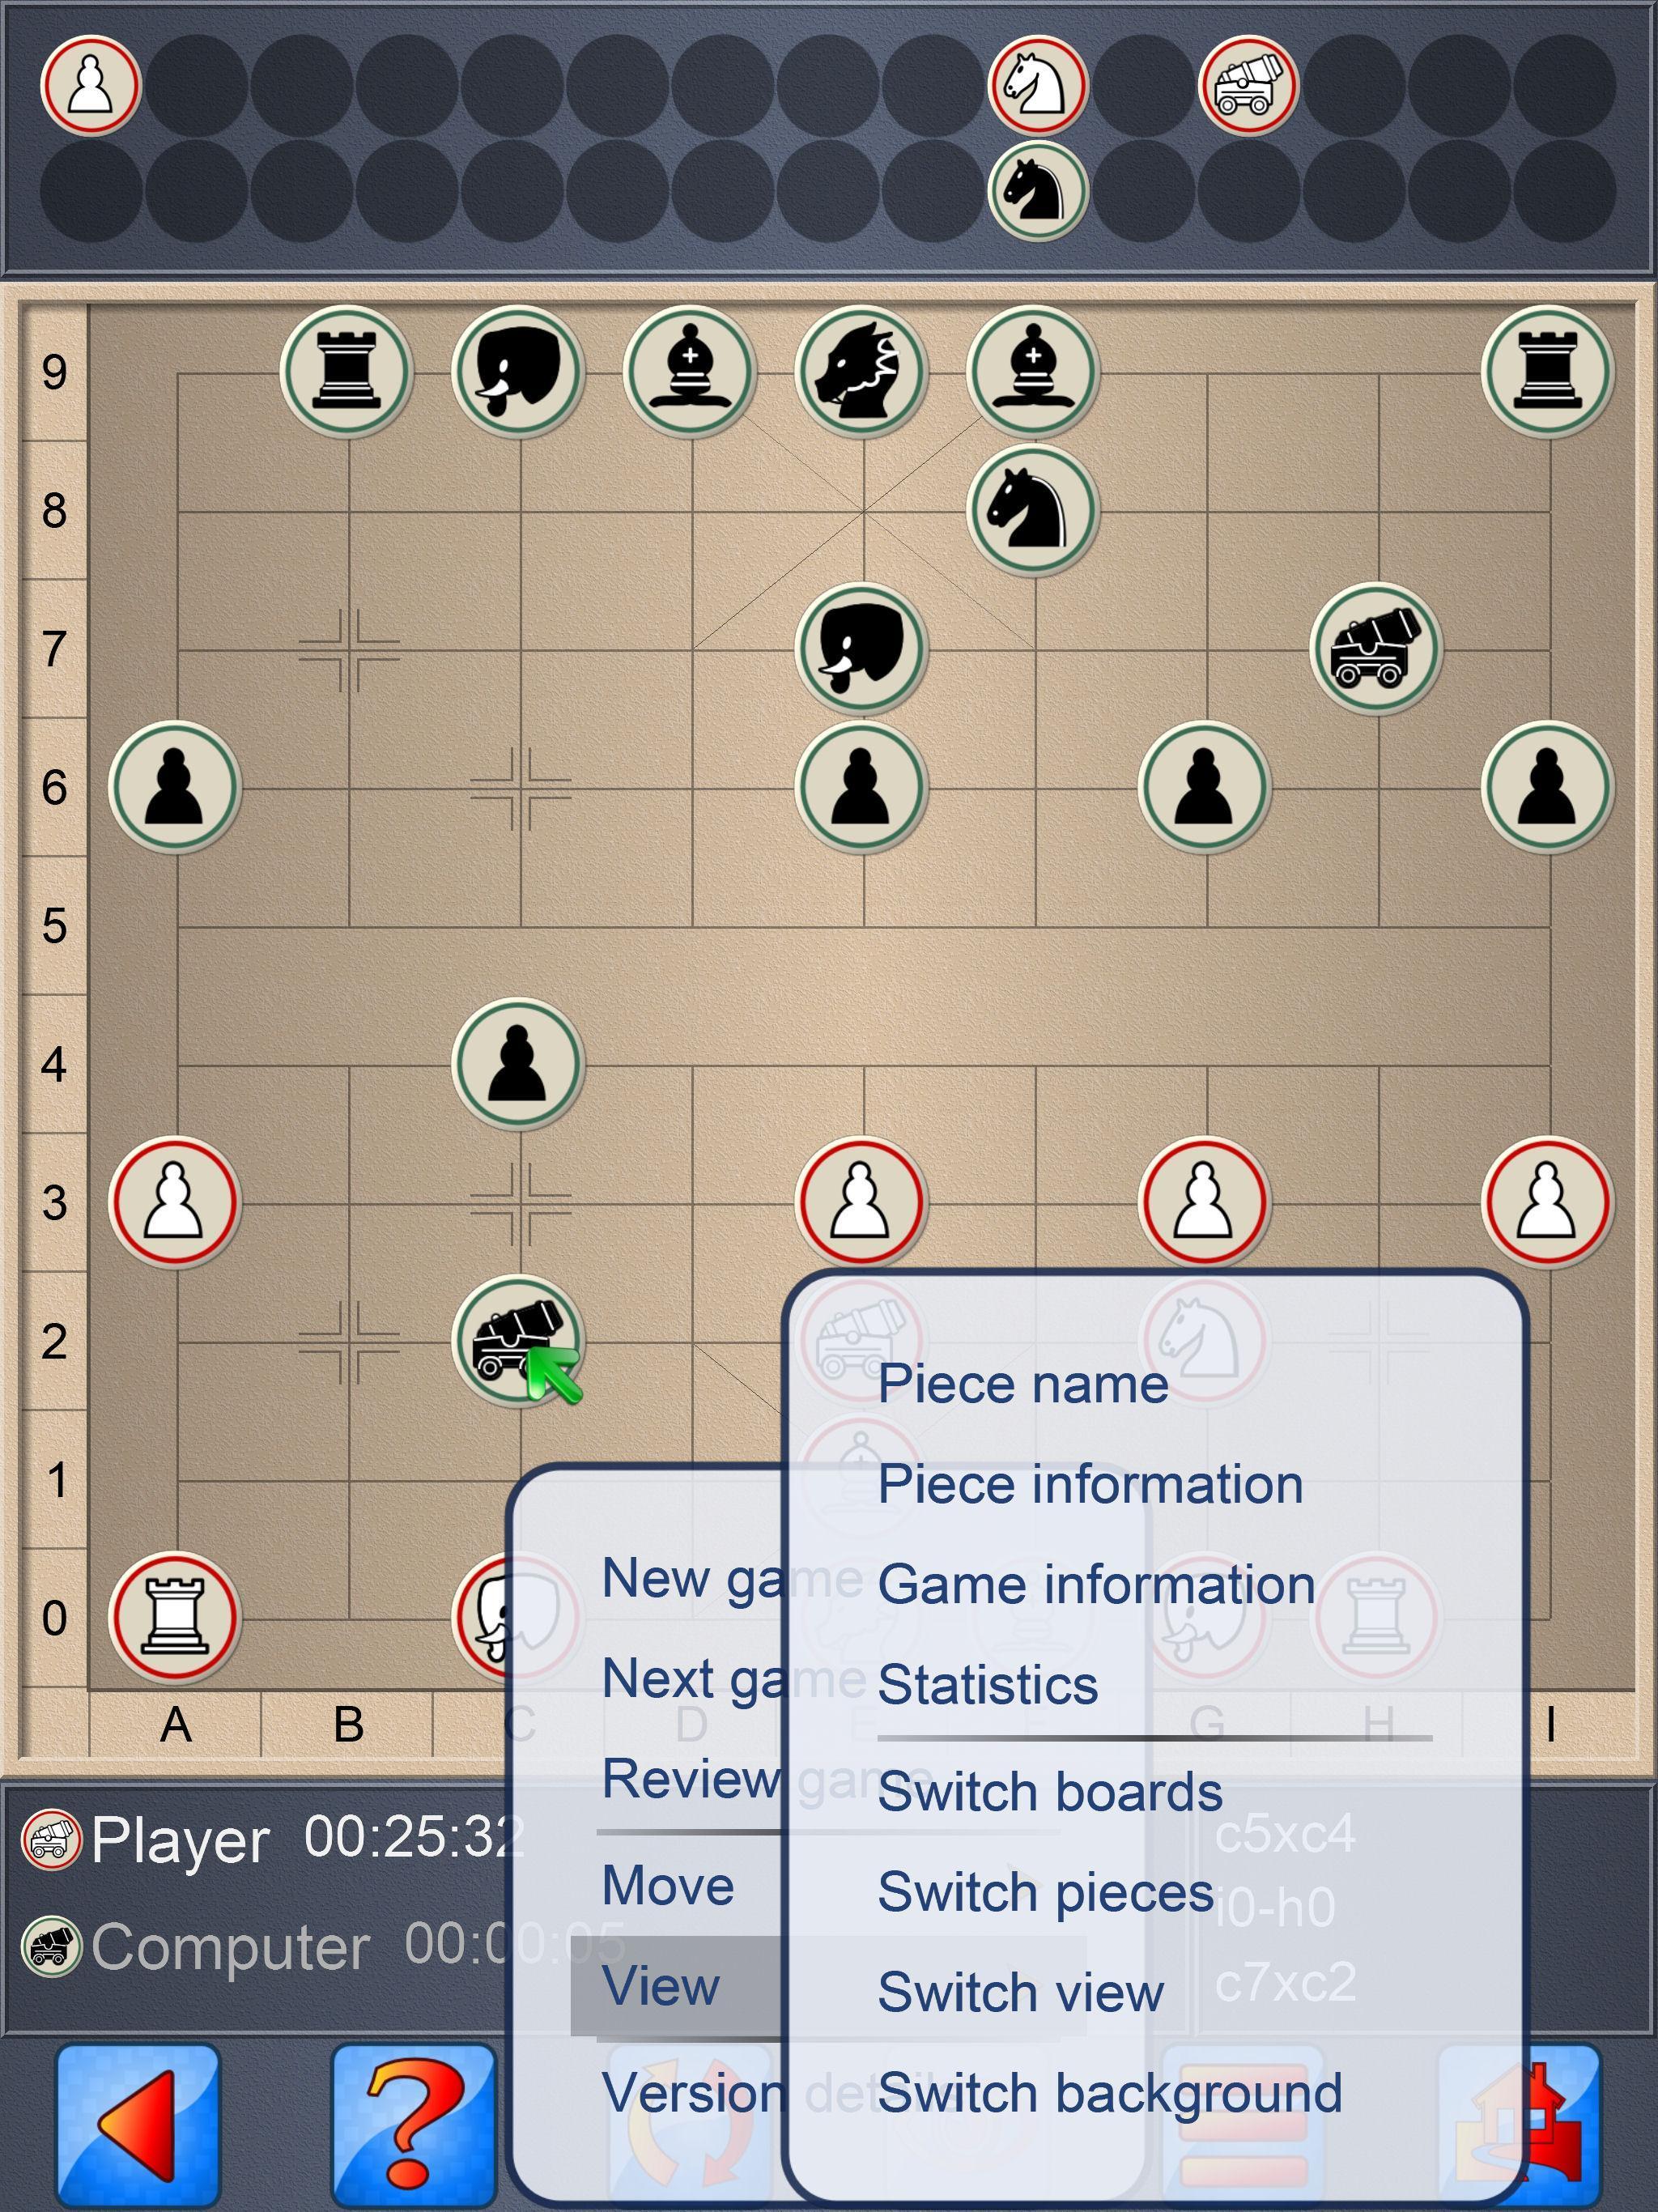 Chinese Chess V+, multiplayer Xiangqi board game 5.25.65 Screenshot 14